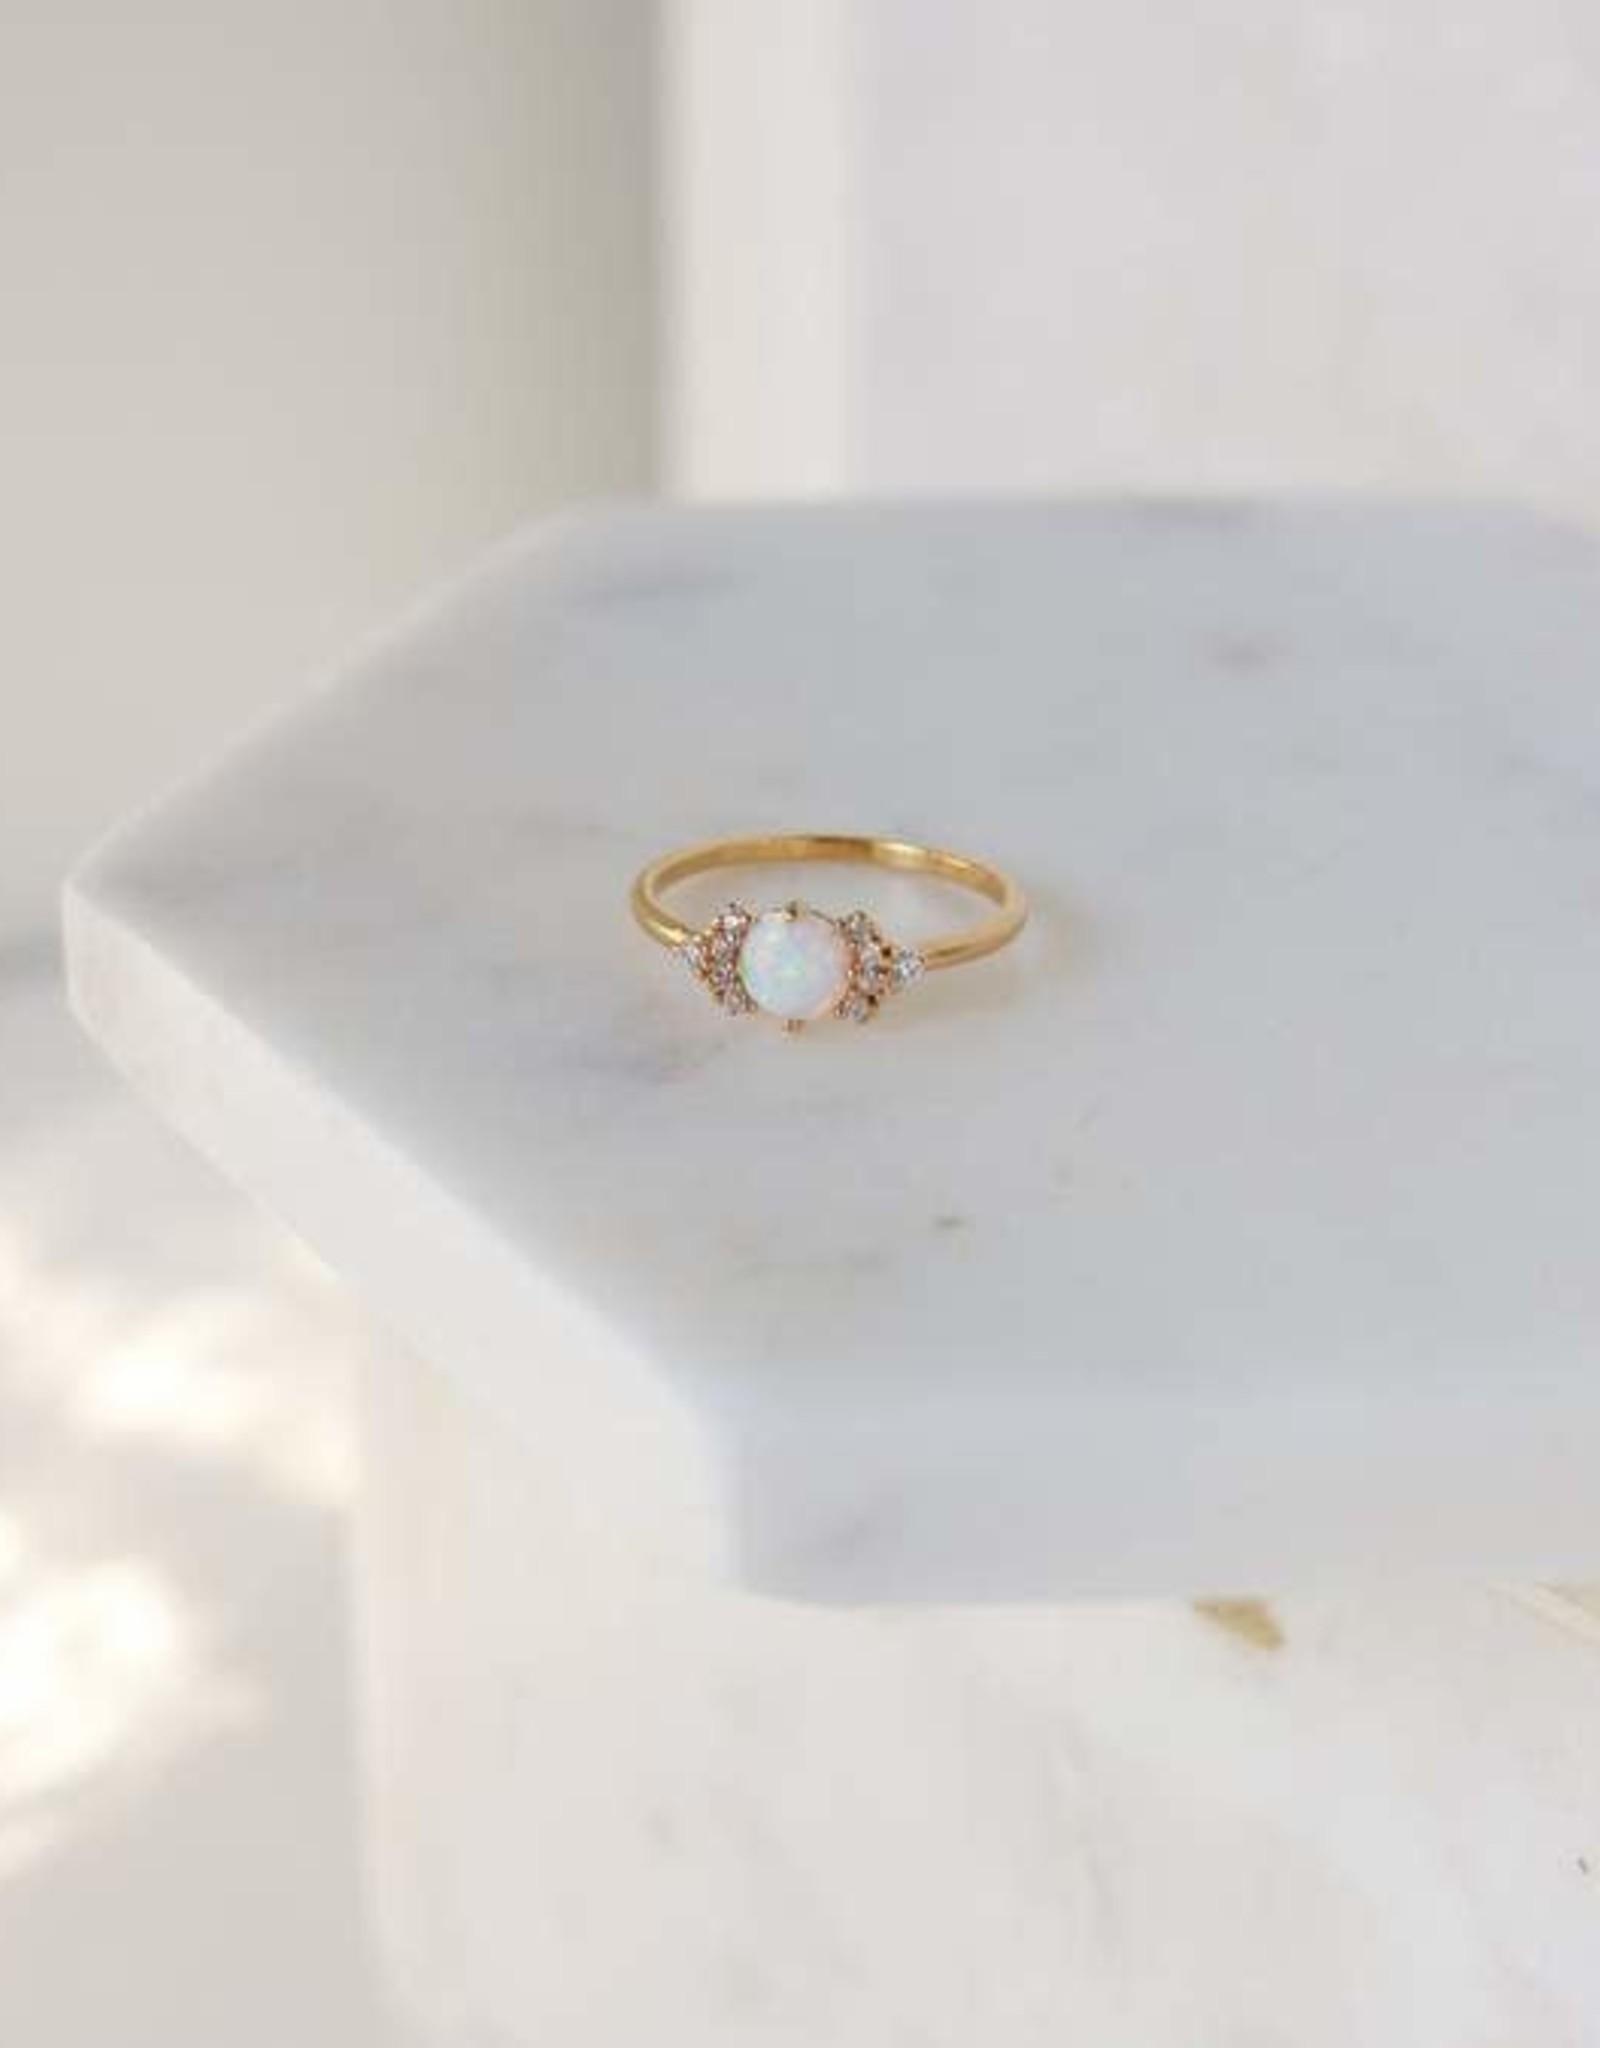 Echo Ring Gold/Opal size 6